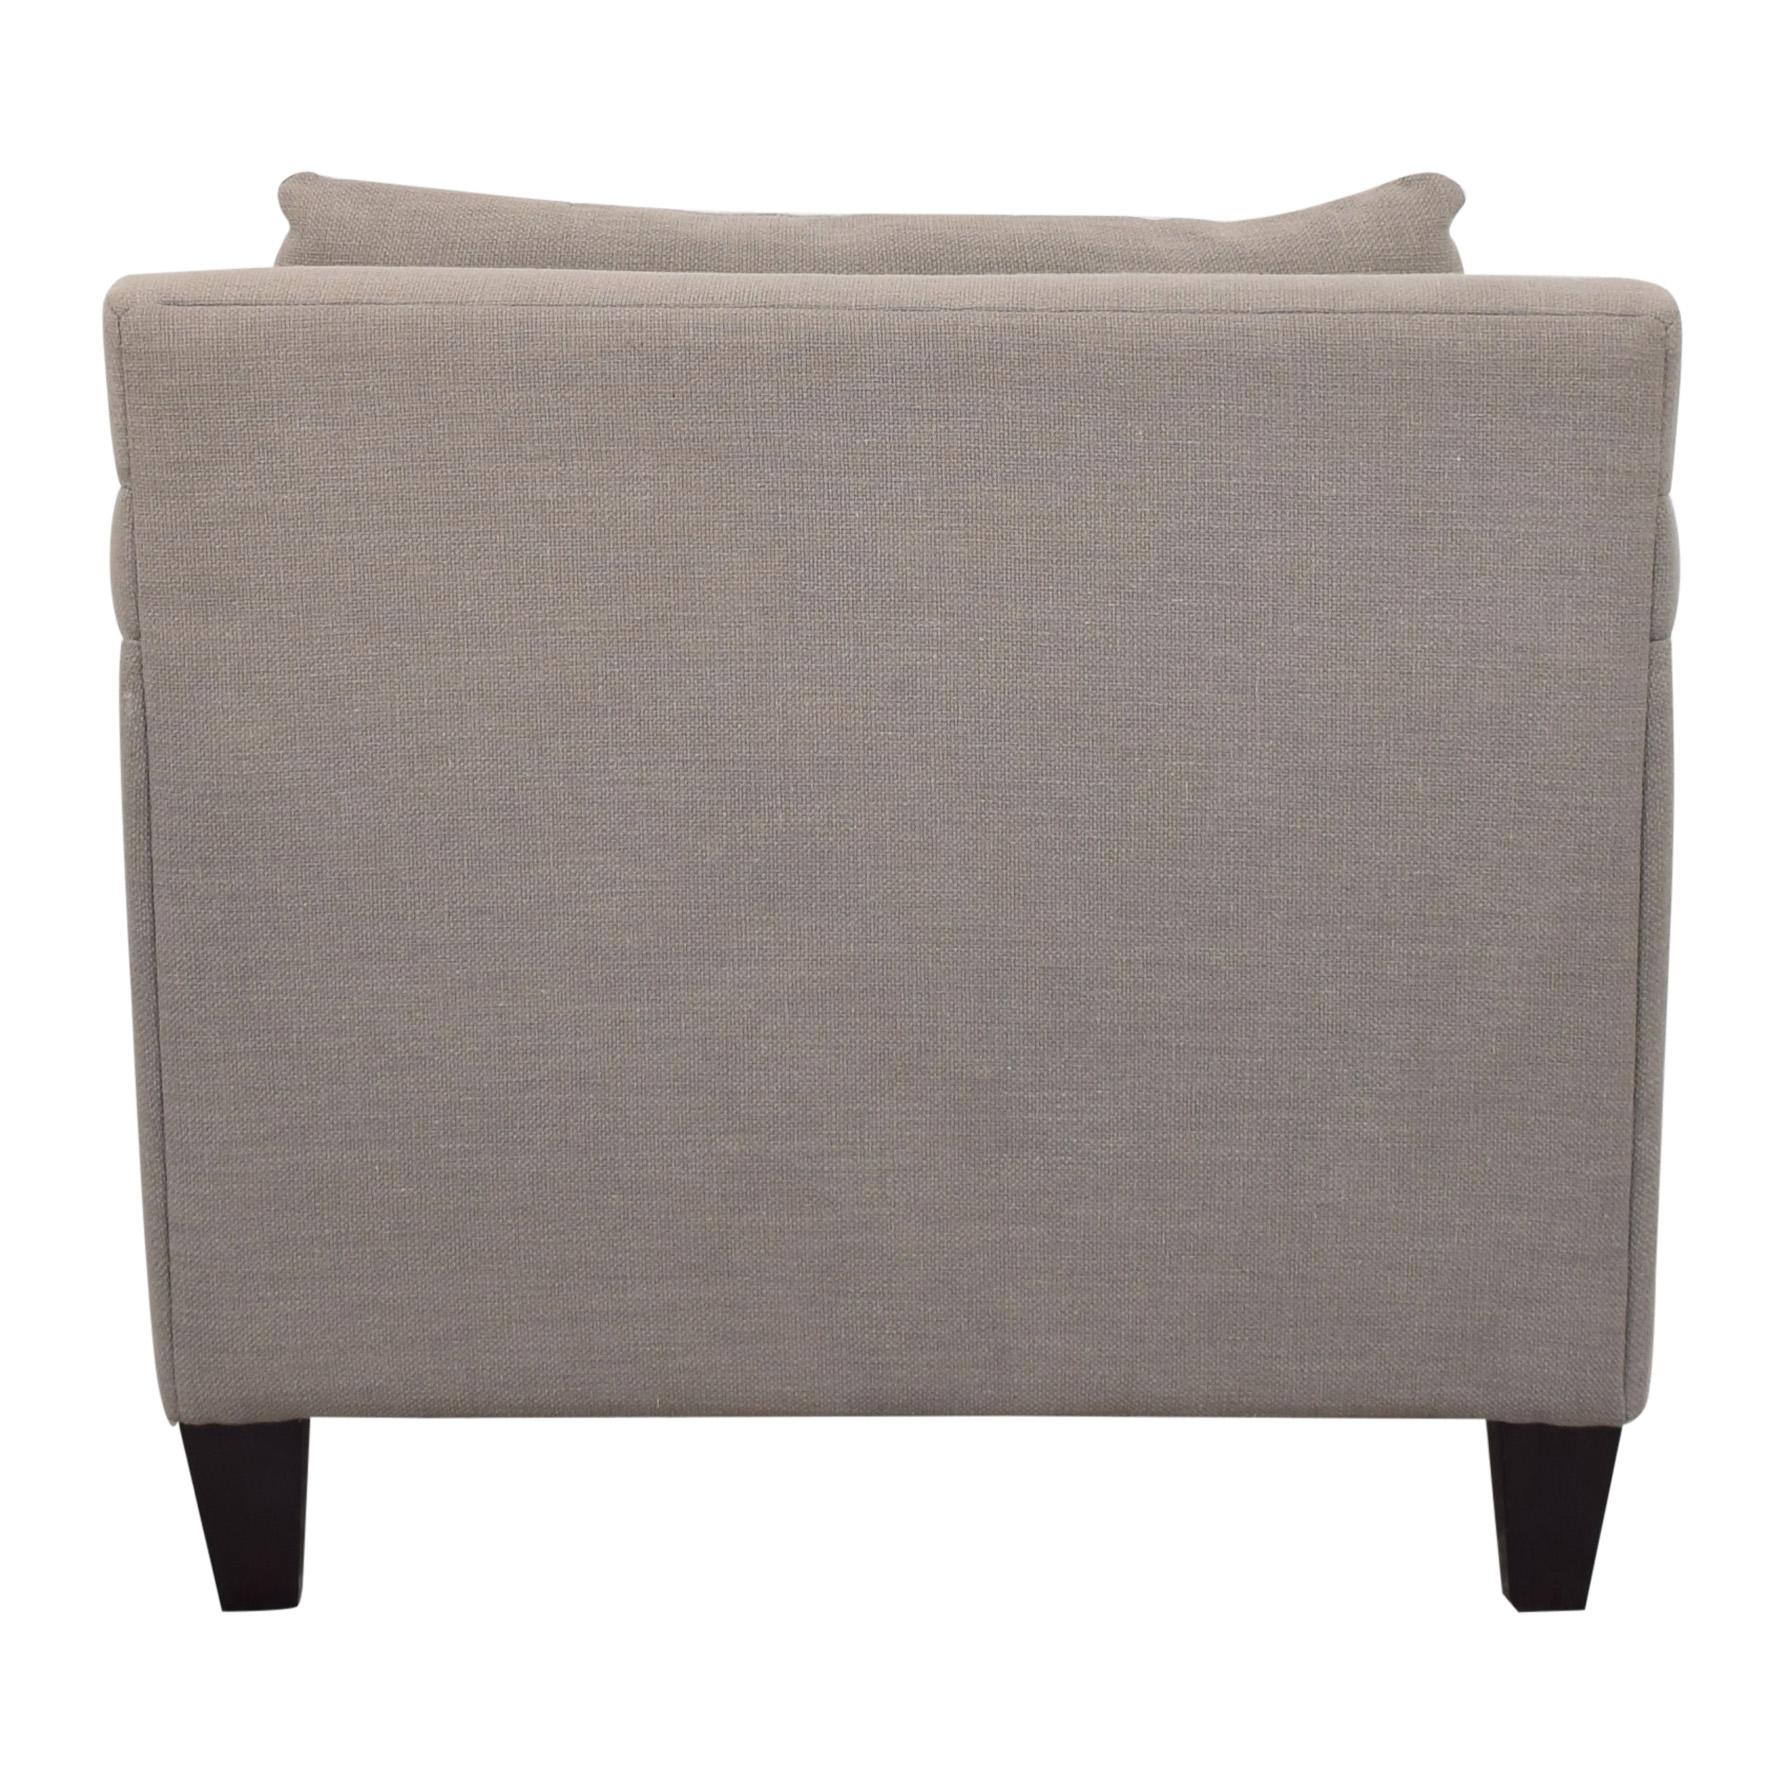 Bauhaus Furniture Bauhaus Furniture Chair and Ottoman Accent Chairs